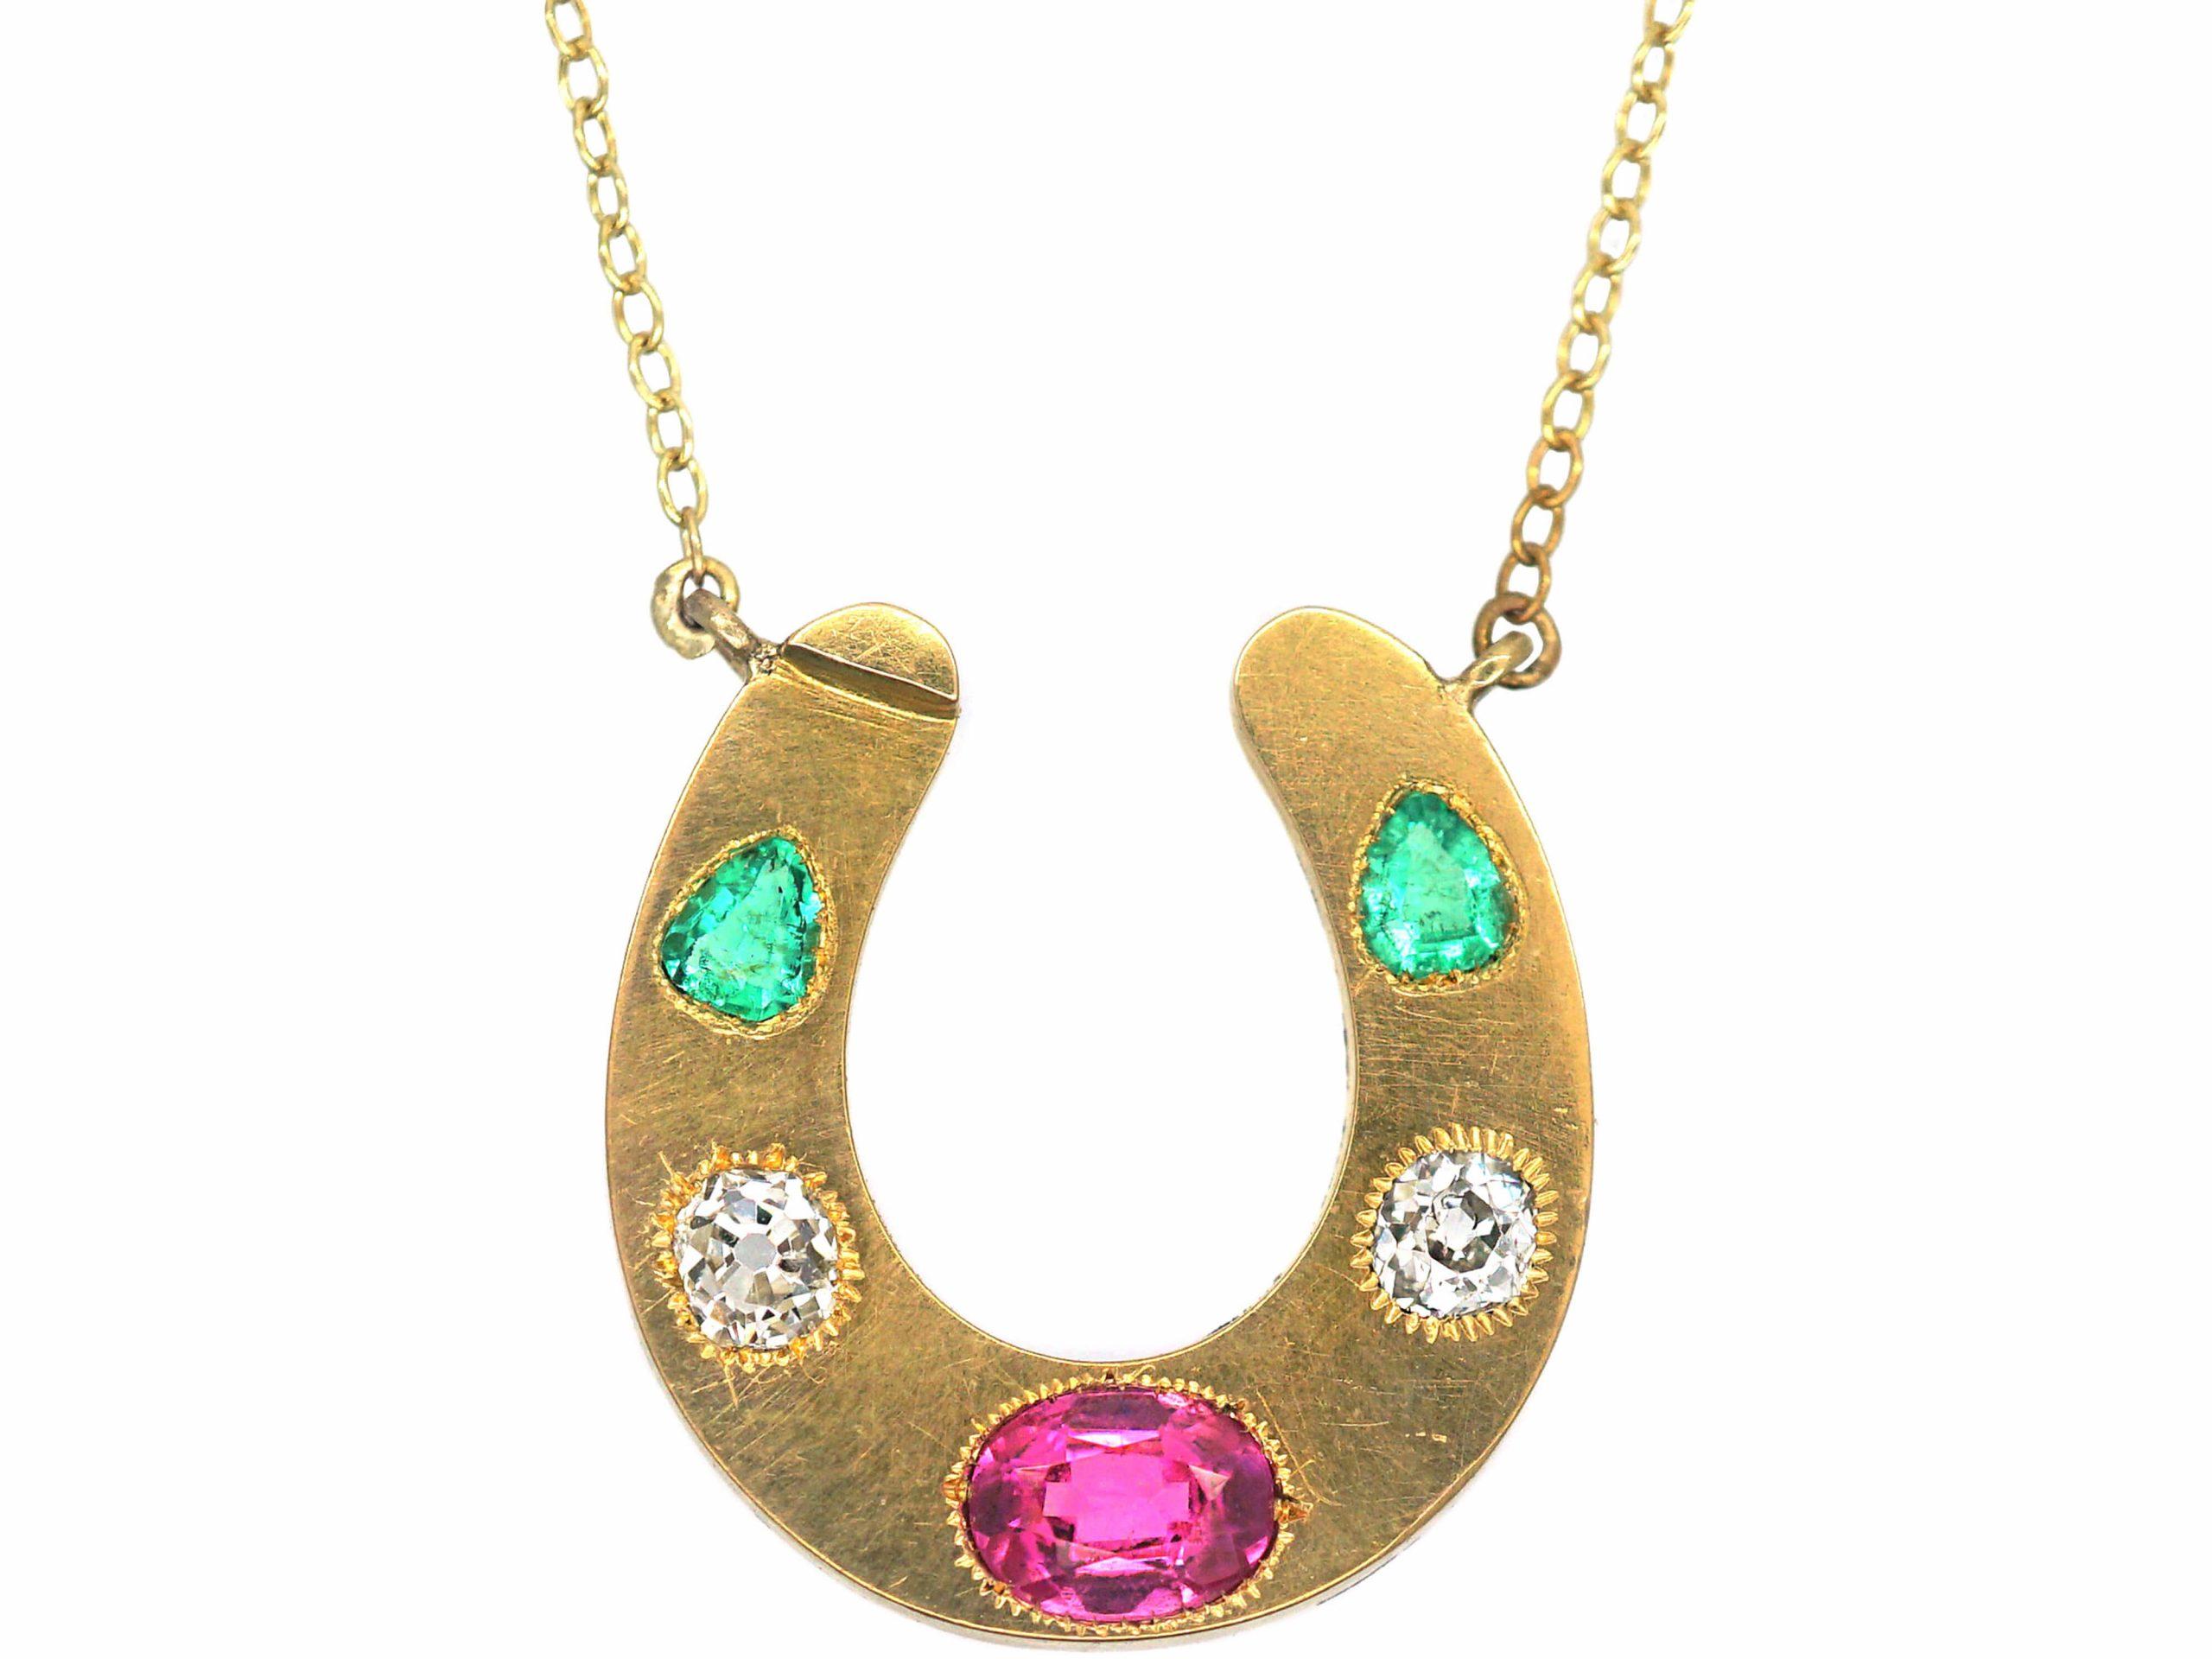 Victorian 18ct Gold & Gem Set Horseshoe Pendant on Gold Chain